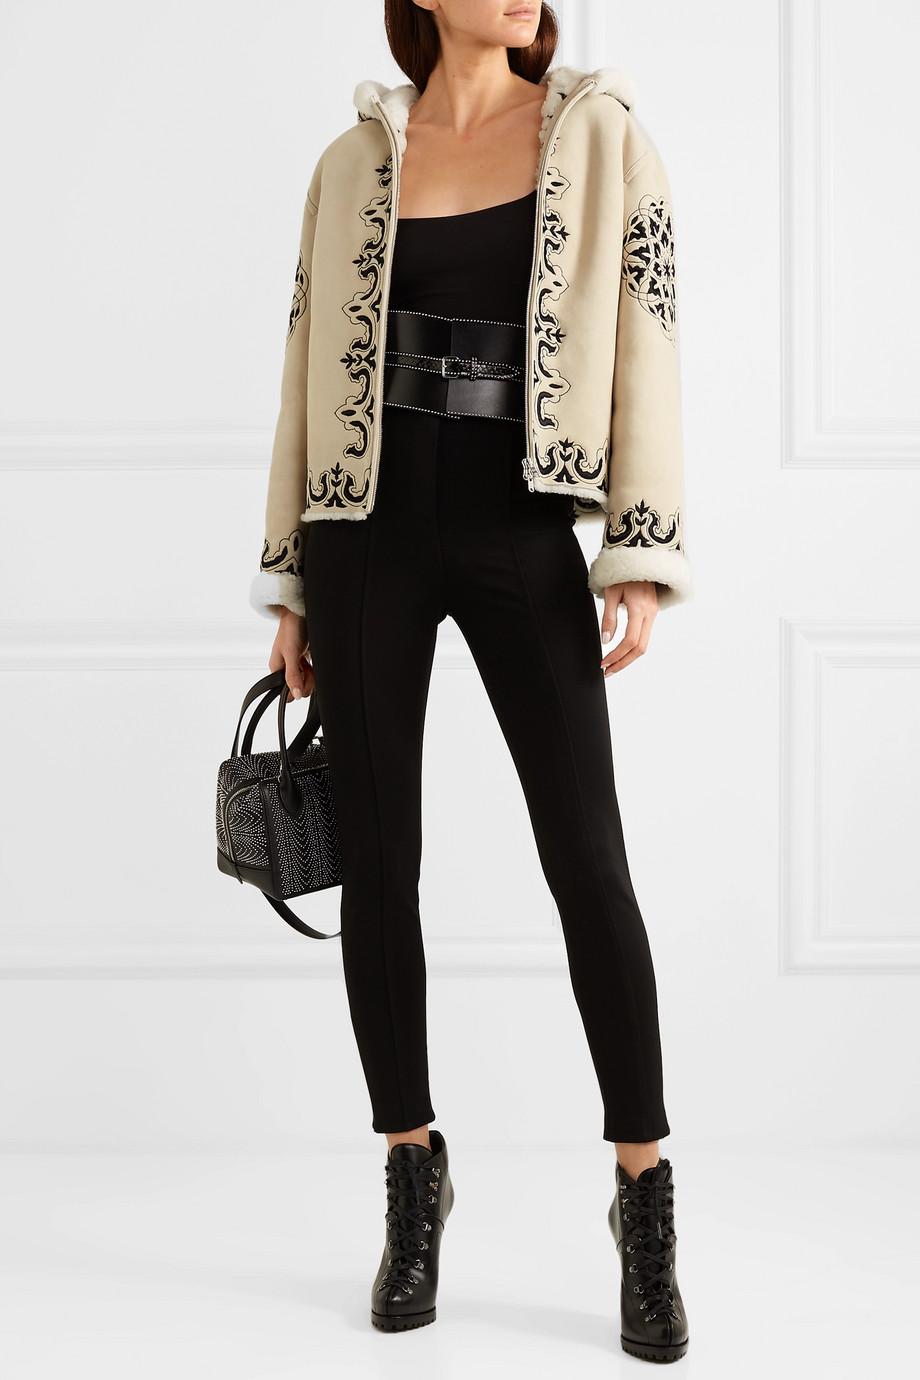 Alaïa Hooded embroidered shearling jacket